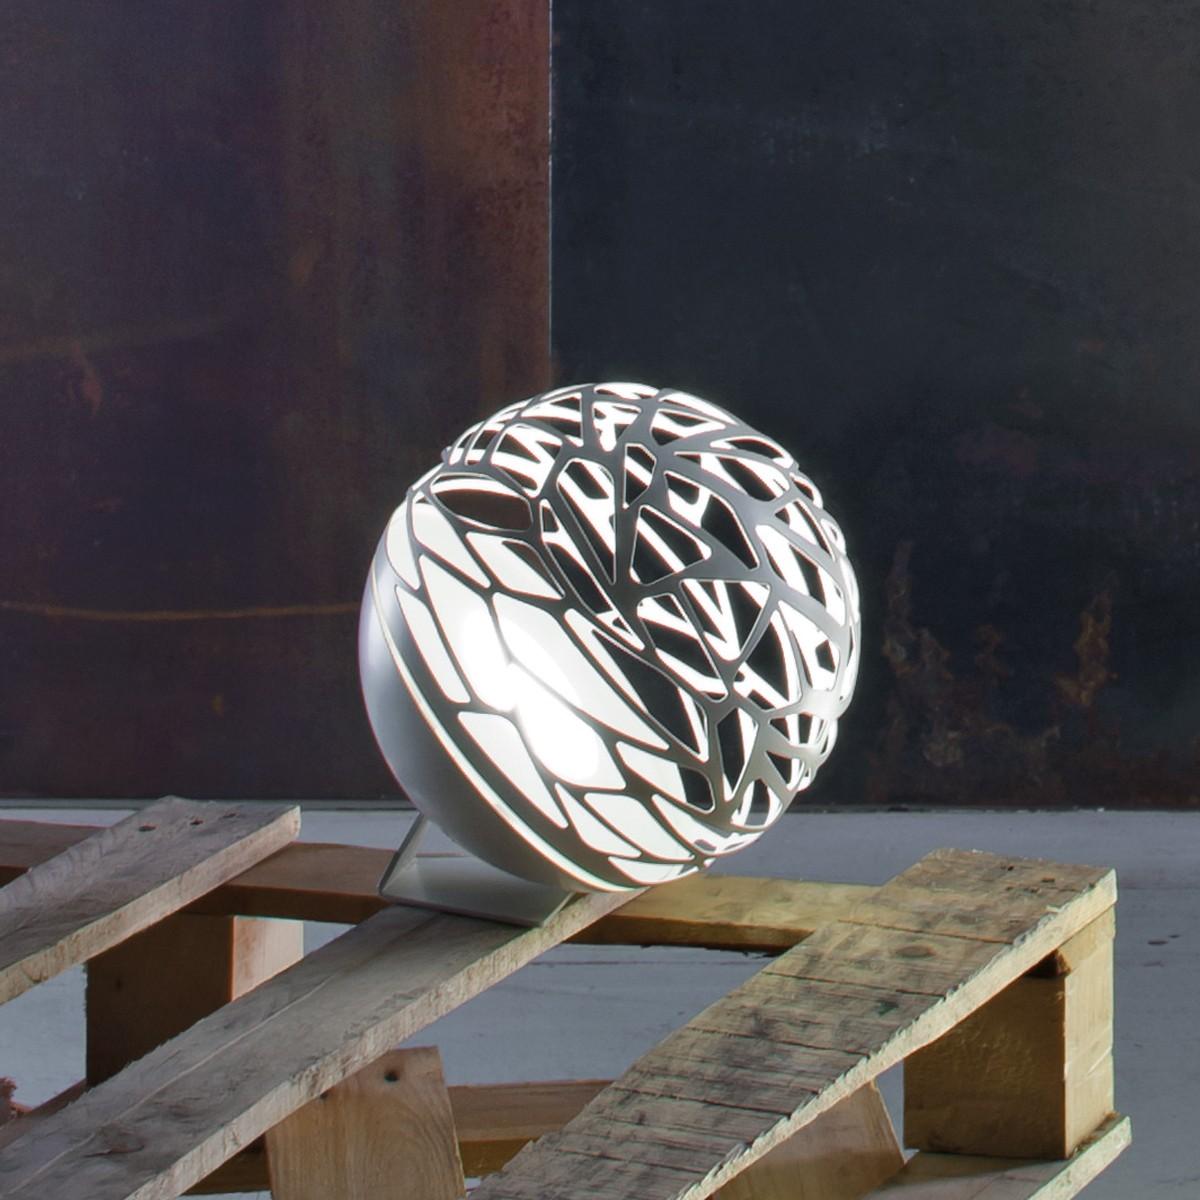 Studio Italia Design Kelly Mini Sphere Tischleuchte, weiß matt